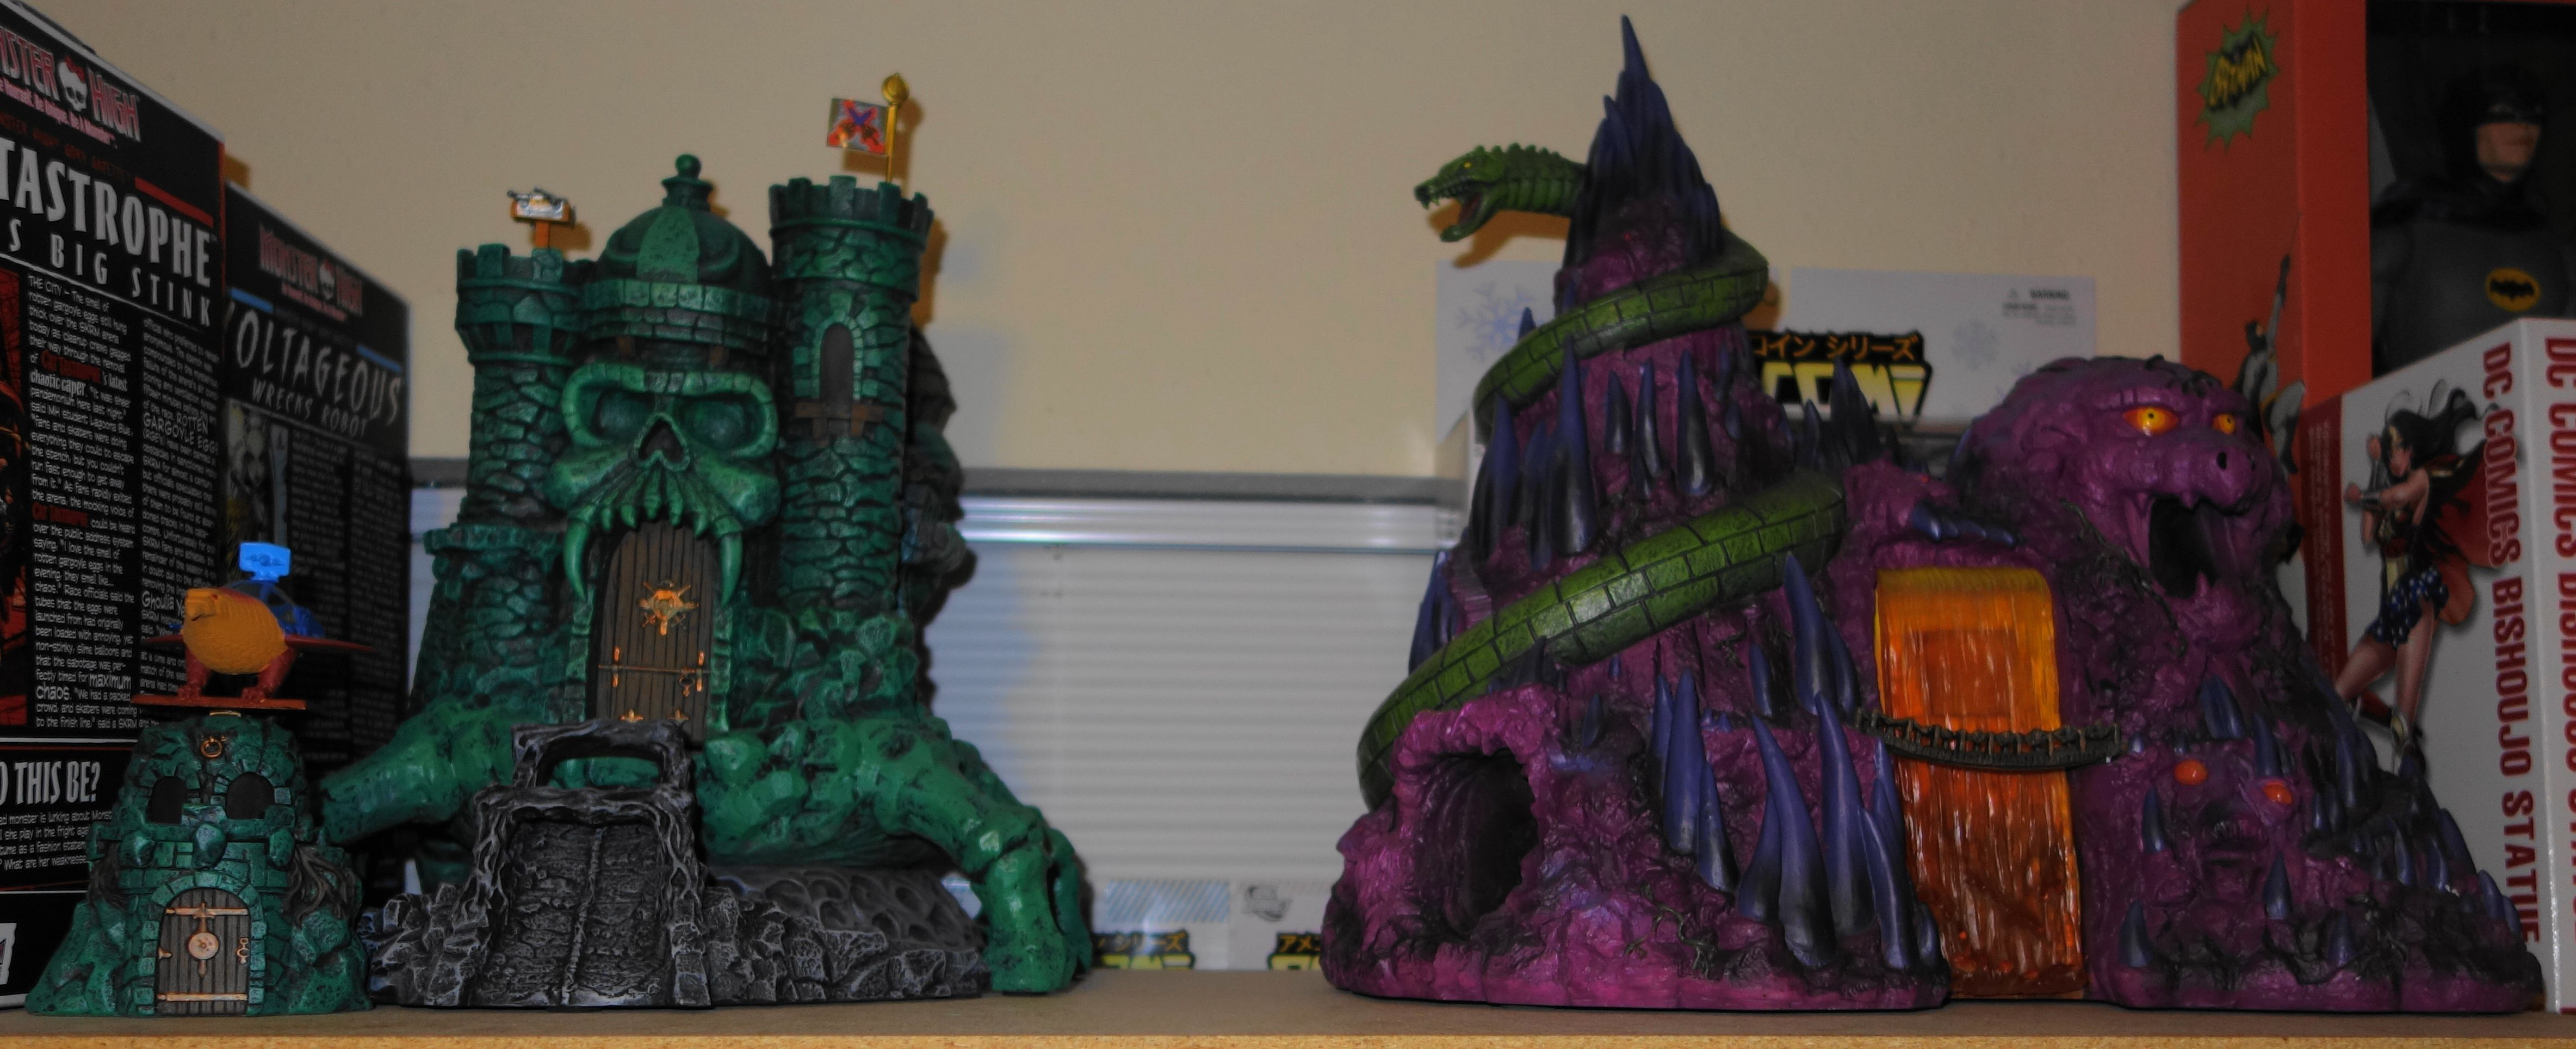 ICON Heroes Castle Grayskull, Grayskull Accesory Kit, and ...